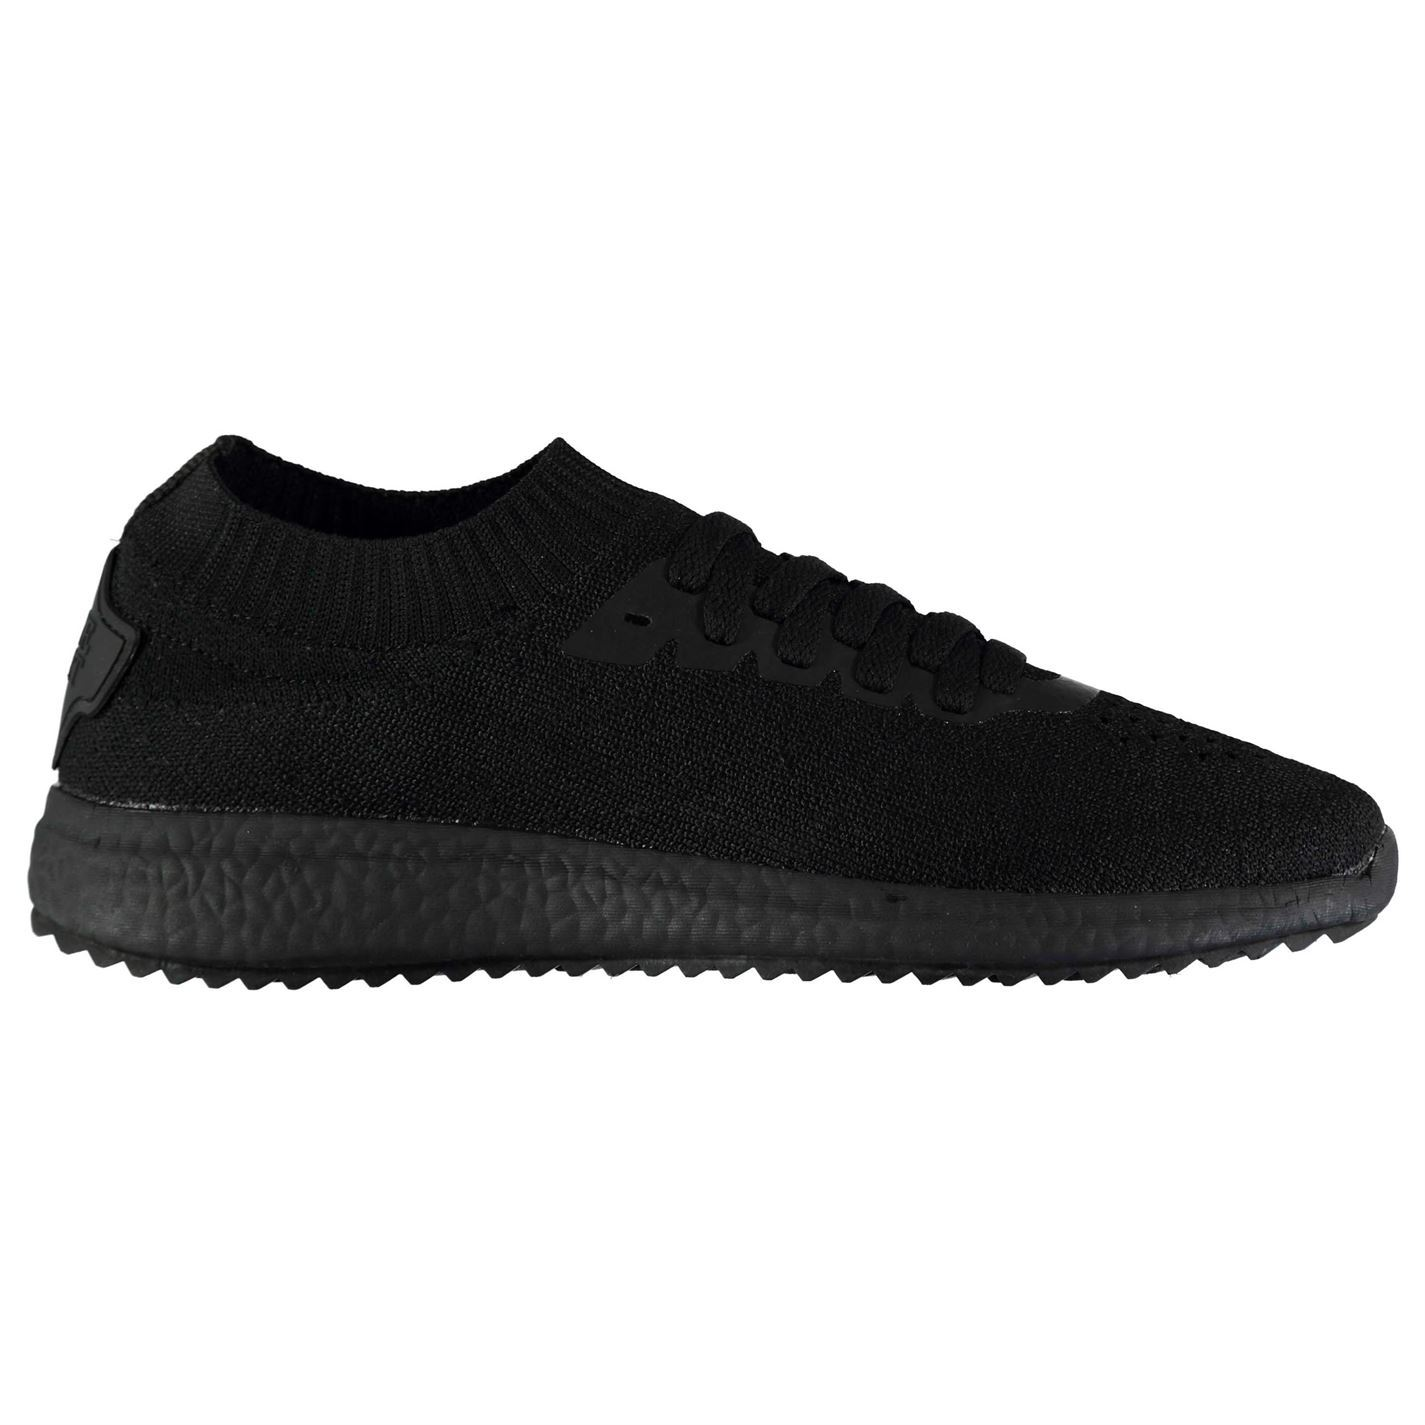 Luke ginnastica Athleisure Lex Sport Calzature Sneakers Uomo Scarpe Scarpe da IHx6Iqrw